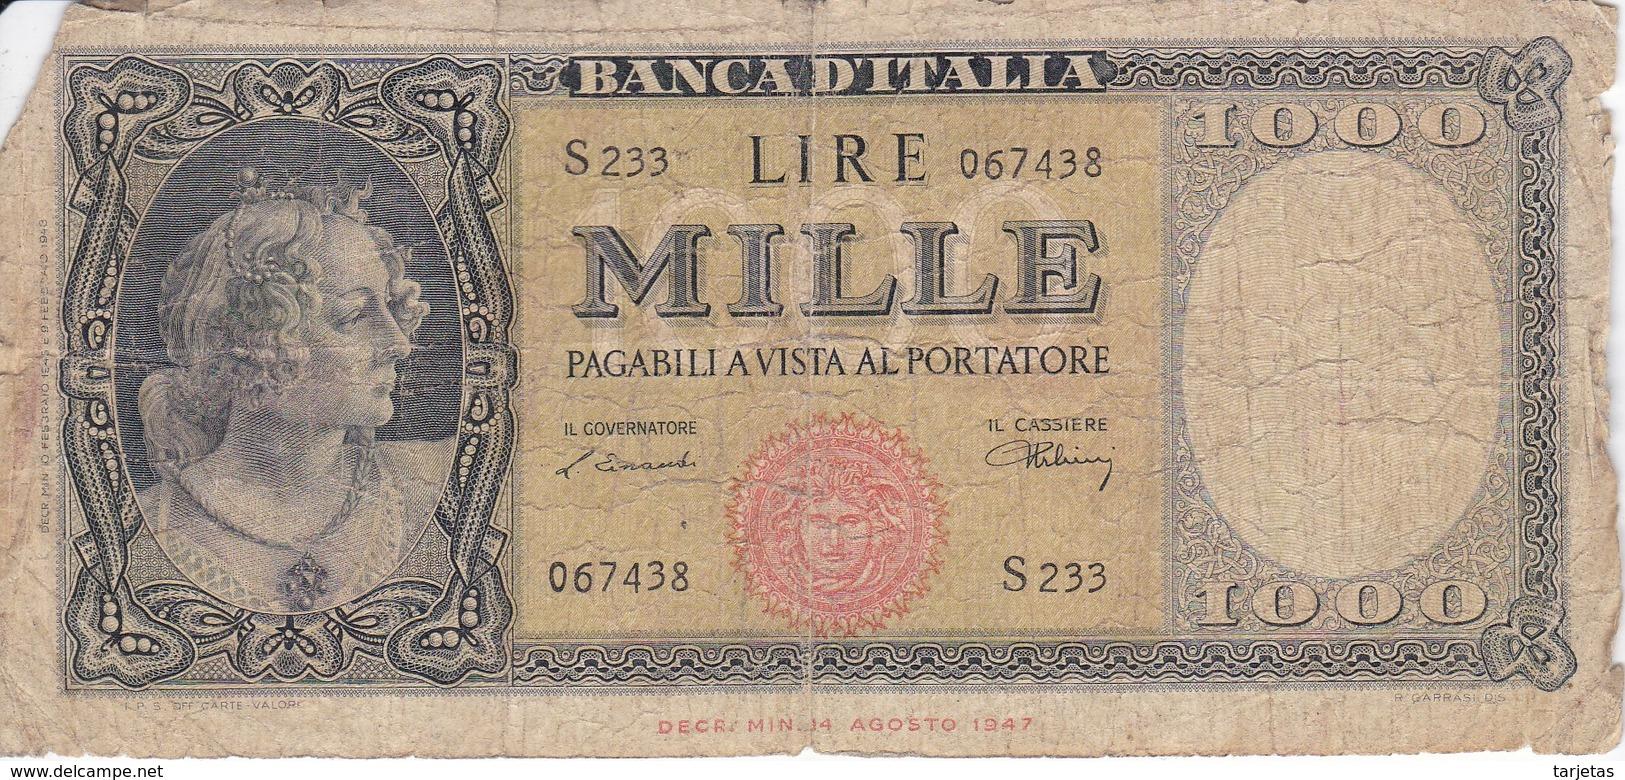 BILLETE DE ITALIA DE 1000 LIRAS DEL 10 DE FEBRERO DE 1948  (BANKNOTE) (RARO) - 1000 Lire